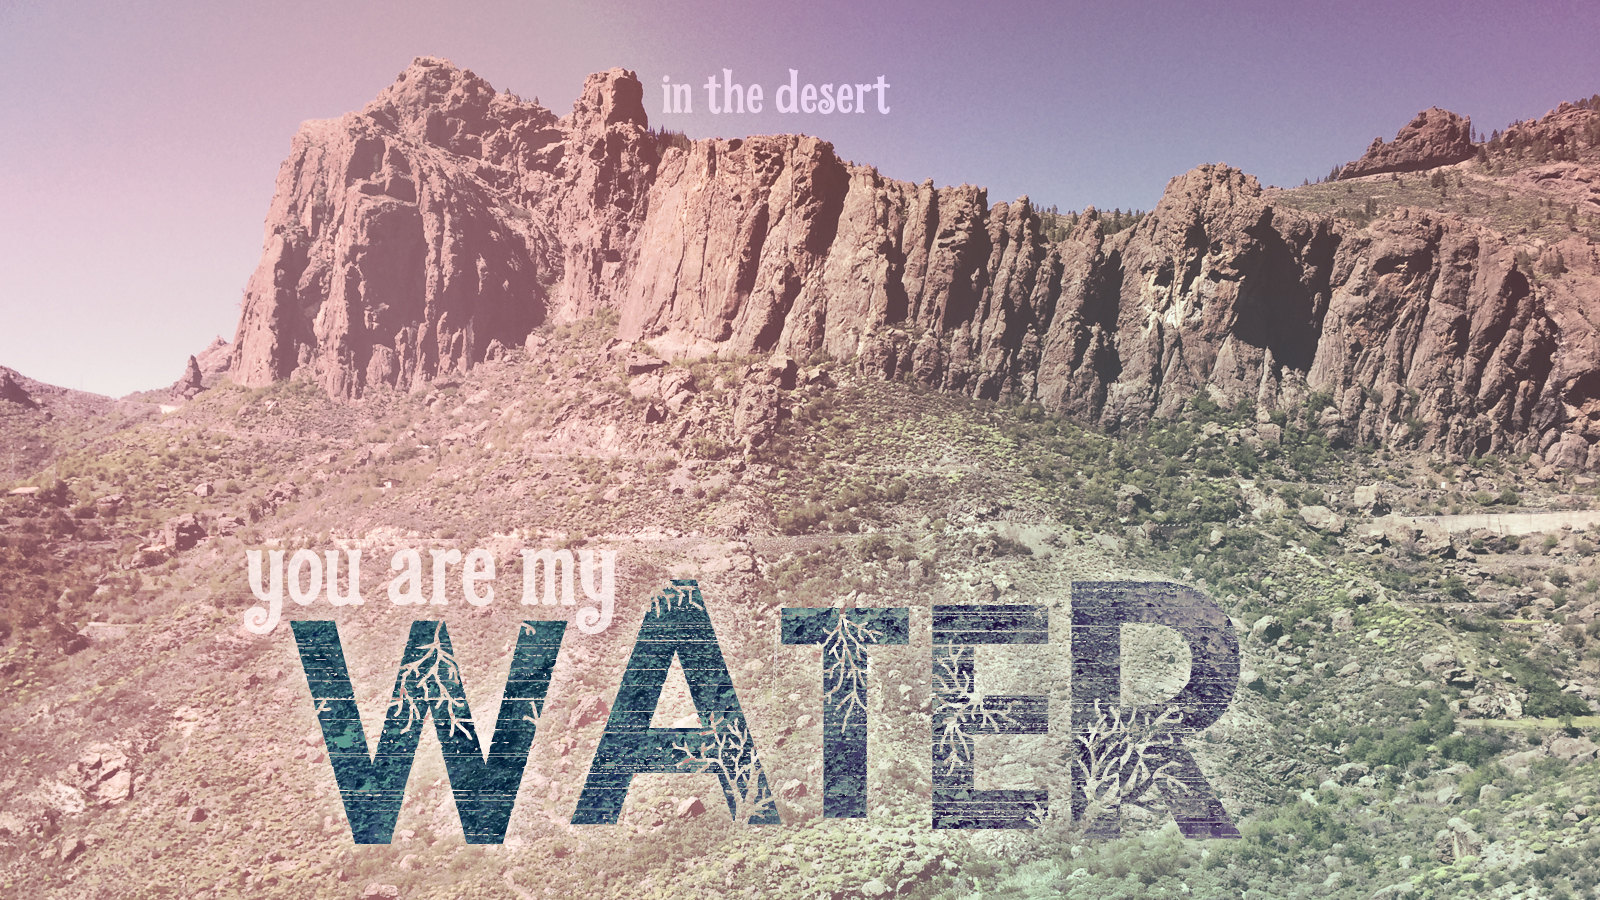 desertsm